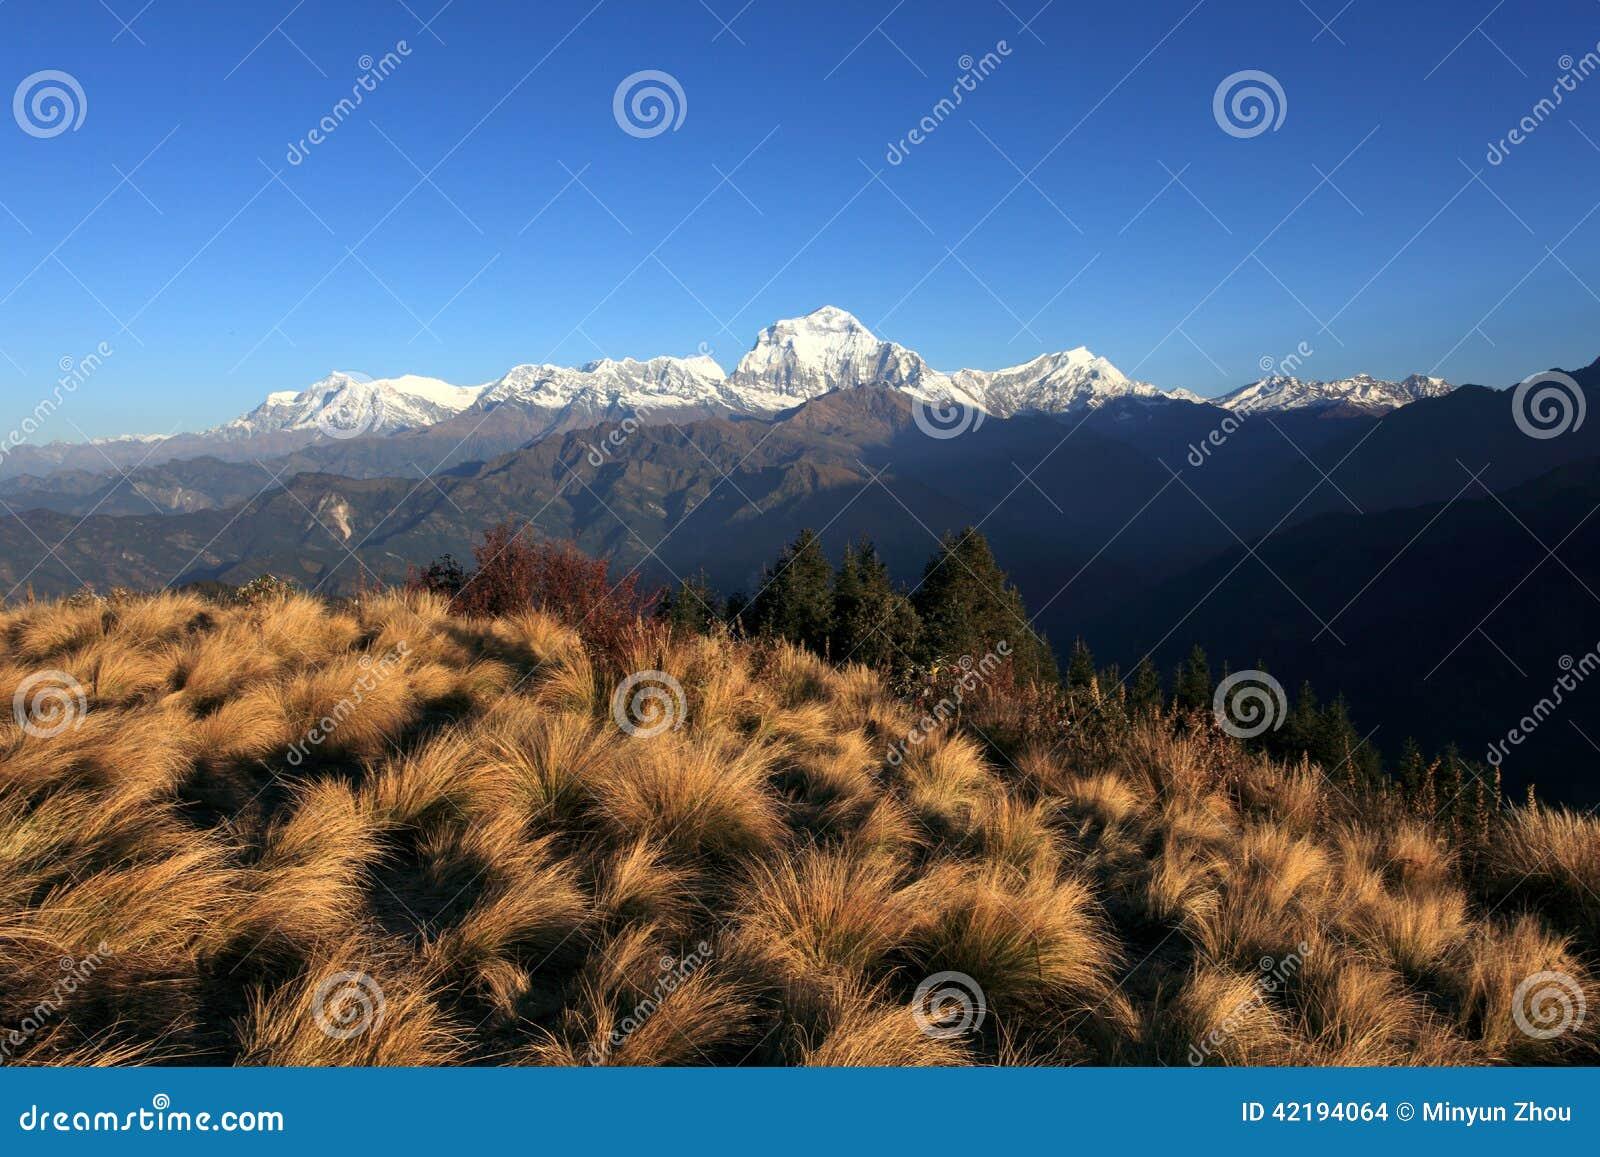 The Himalaya Mountains Range